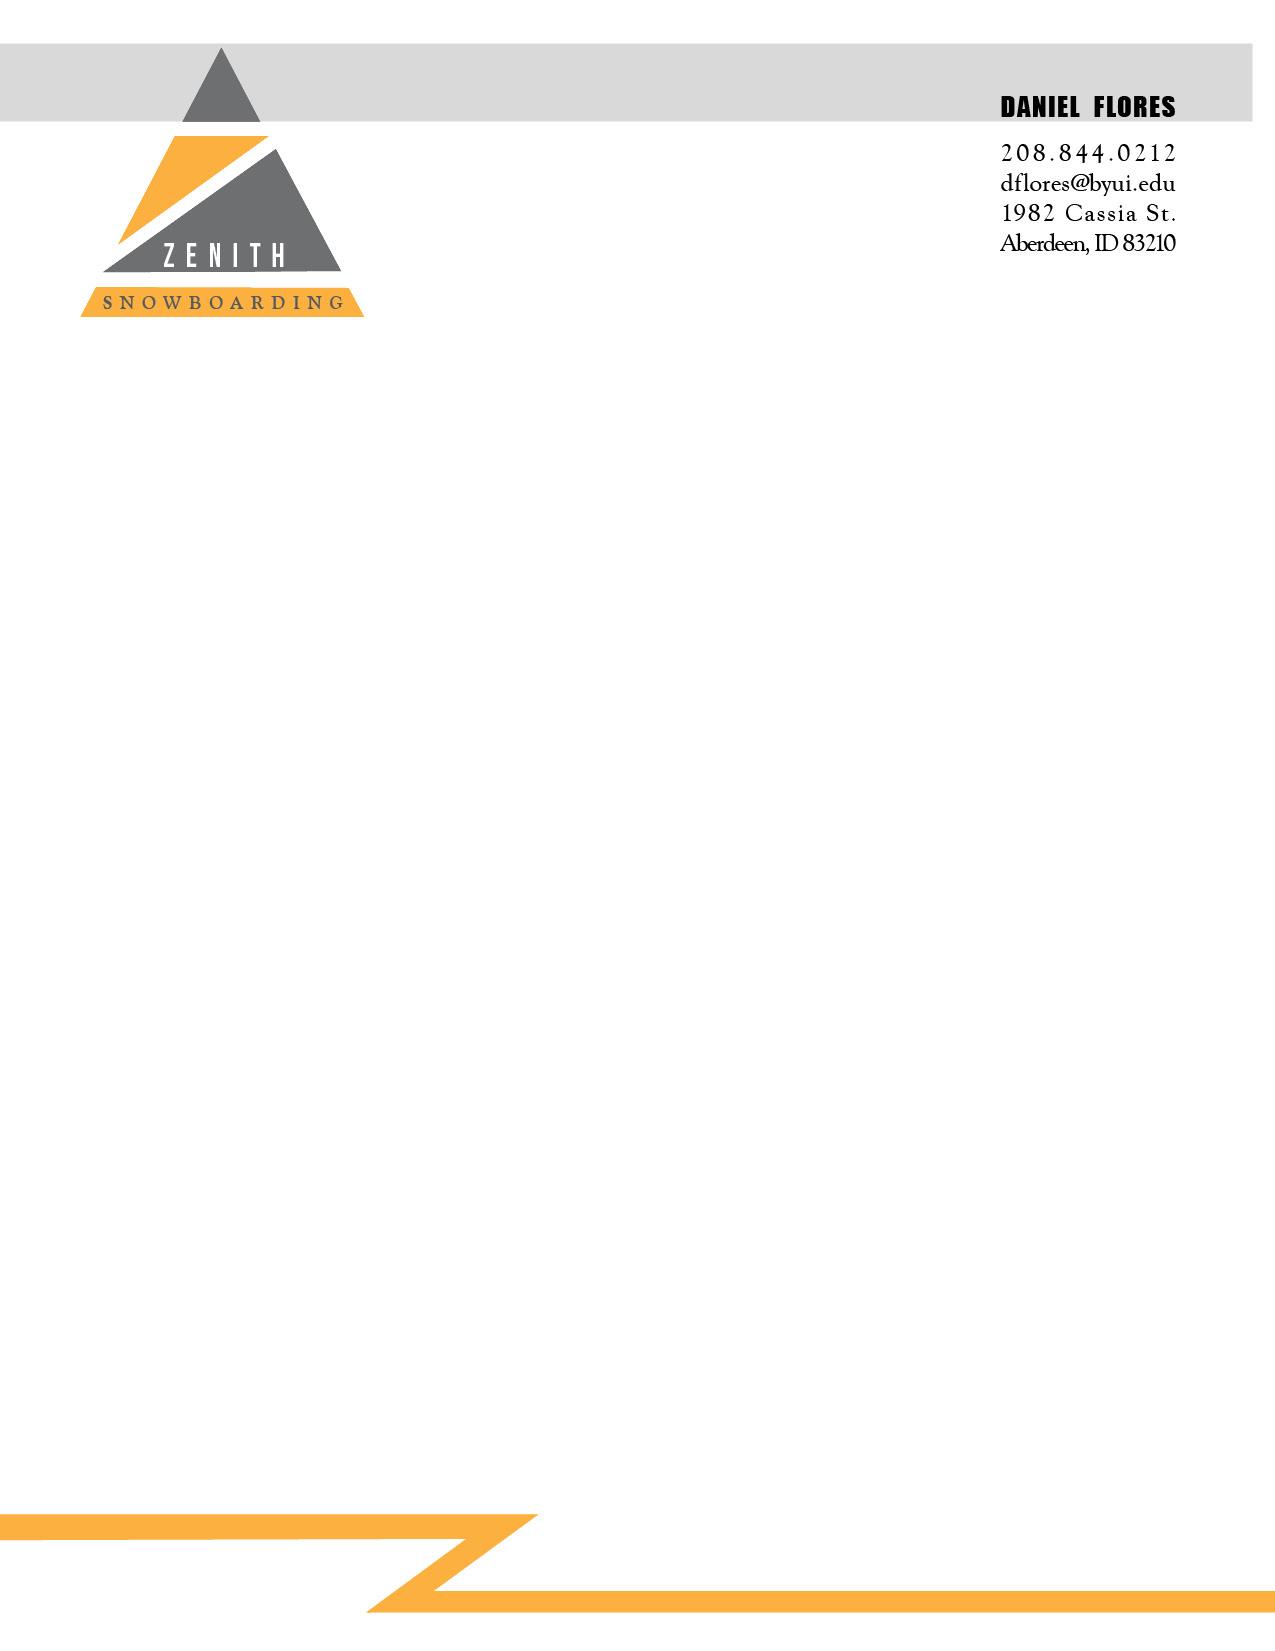 letterhead logos